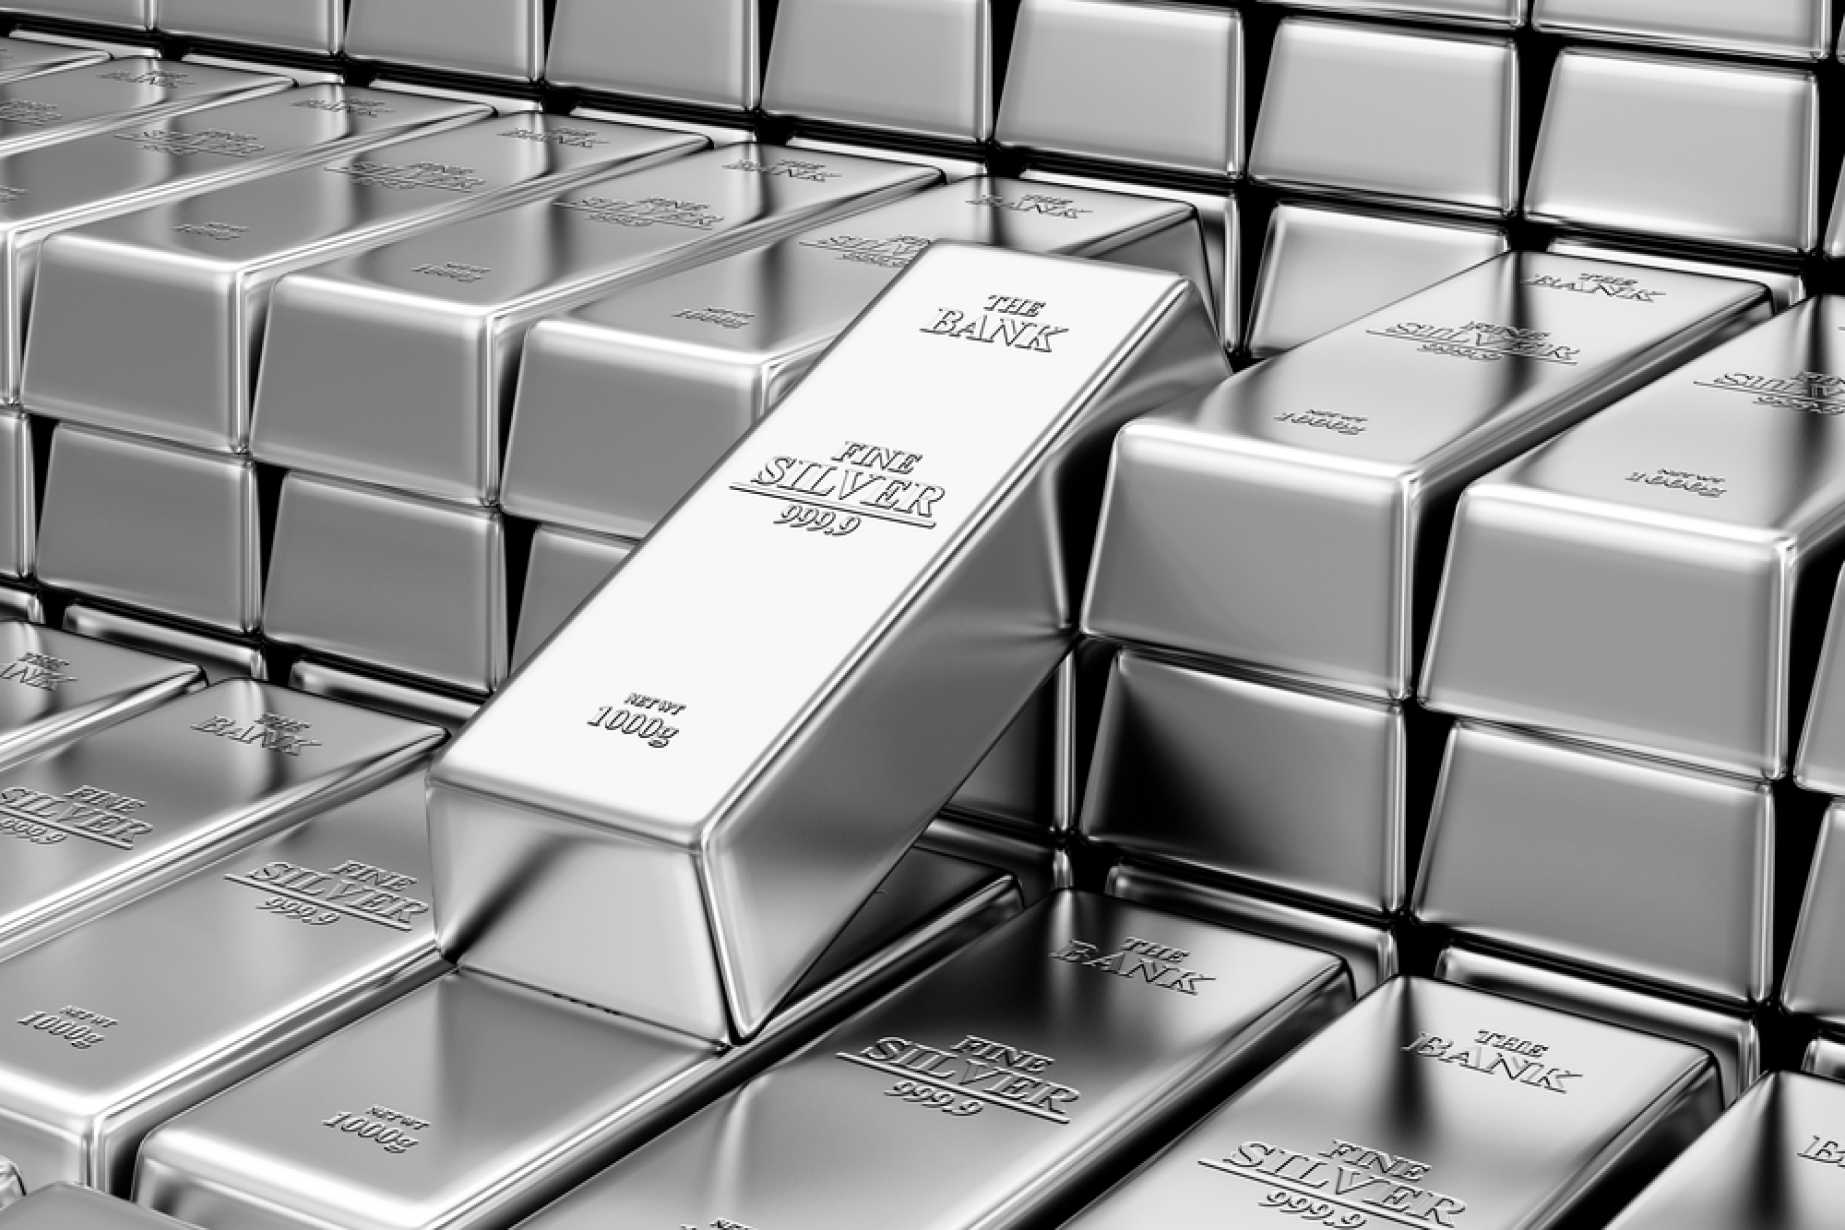 Todays silver rate in tirupati